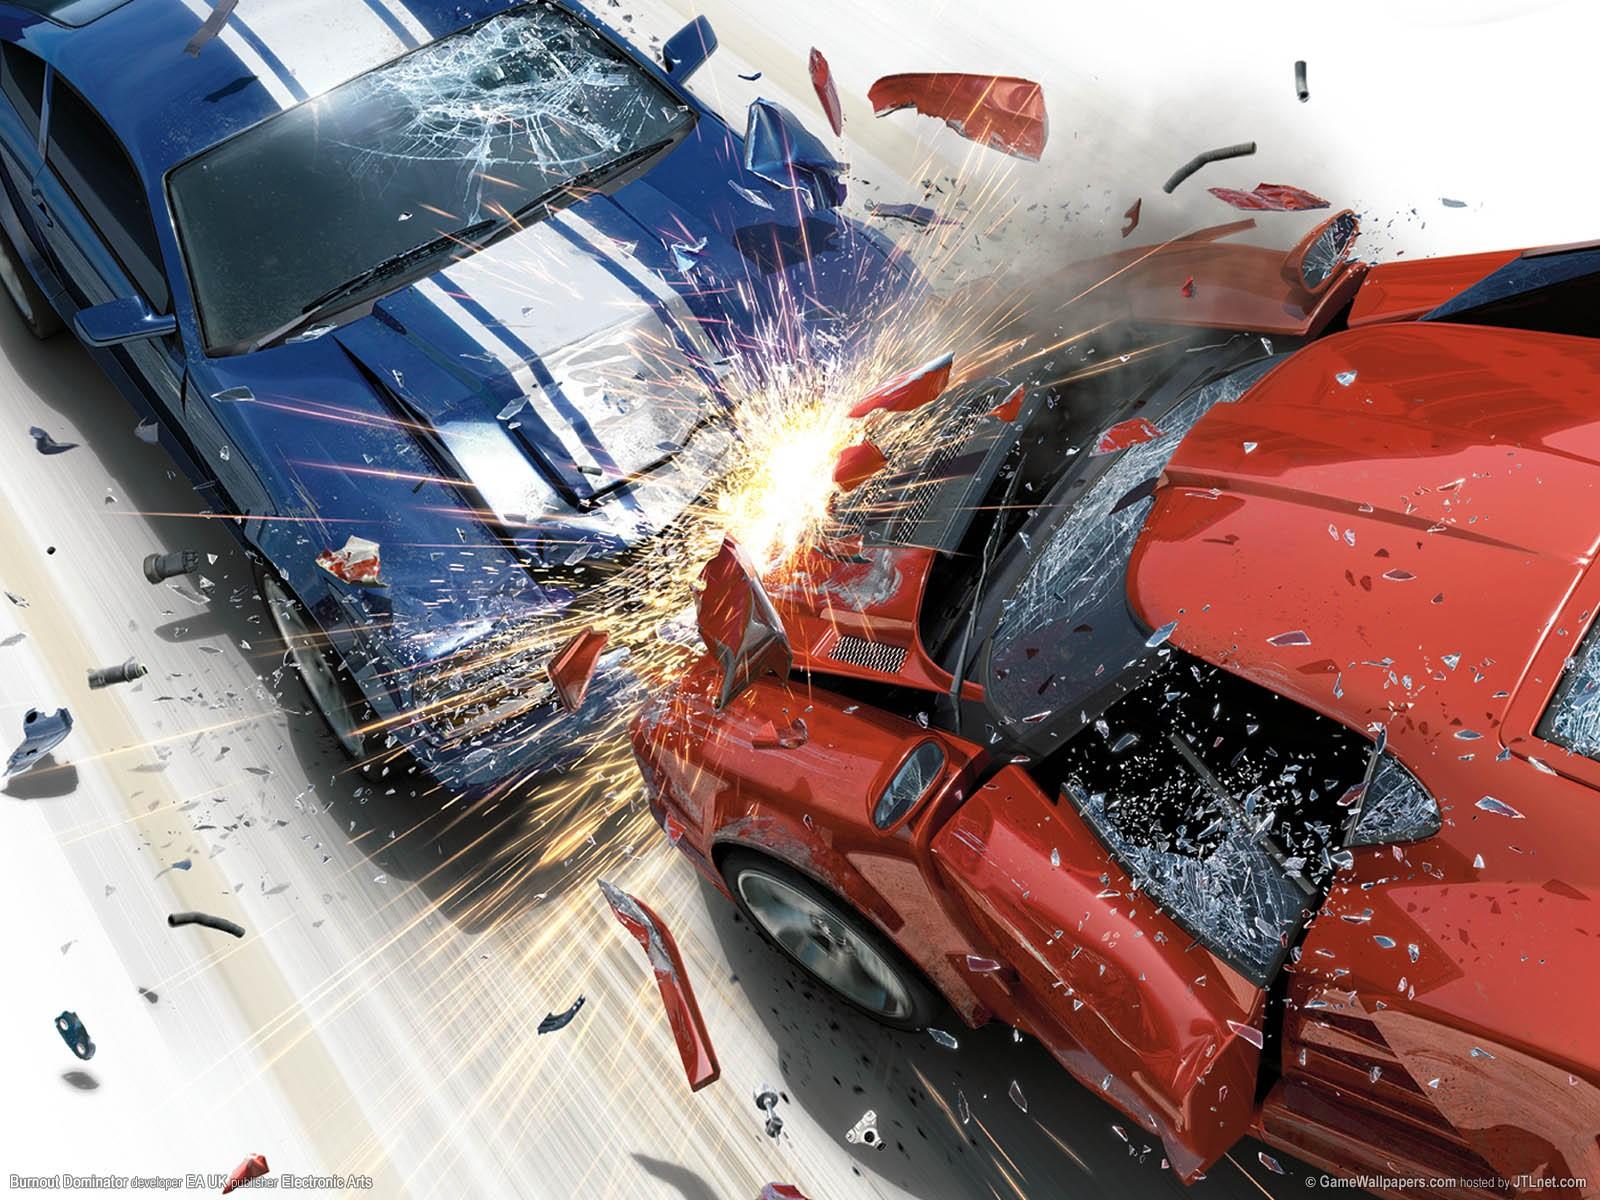 Wallpaper : video games, Lamborghini, muscle cars, sports car, crash ...